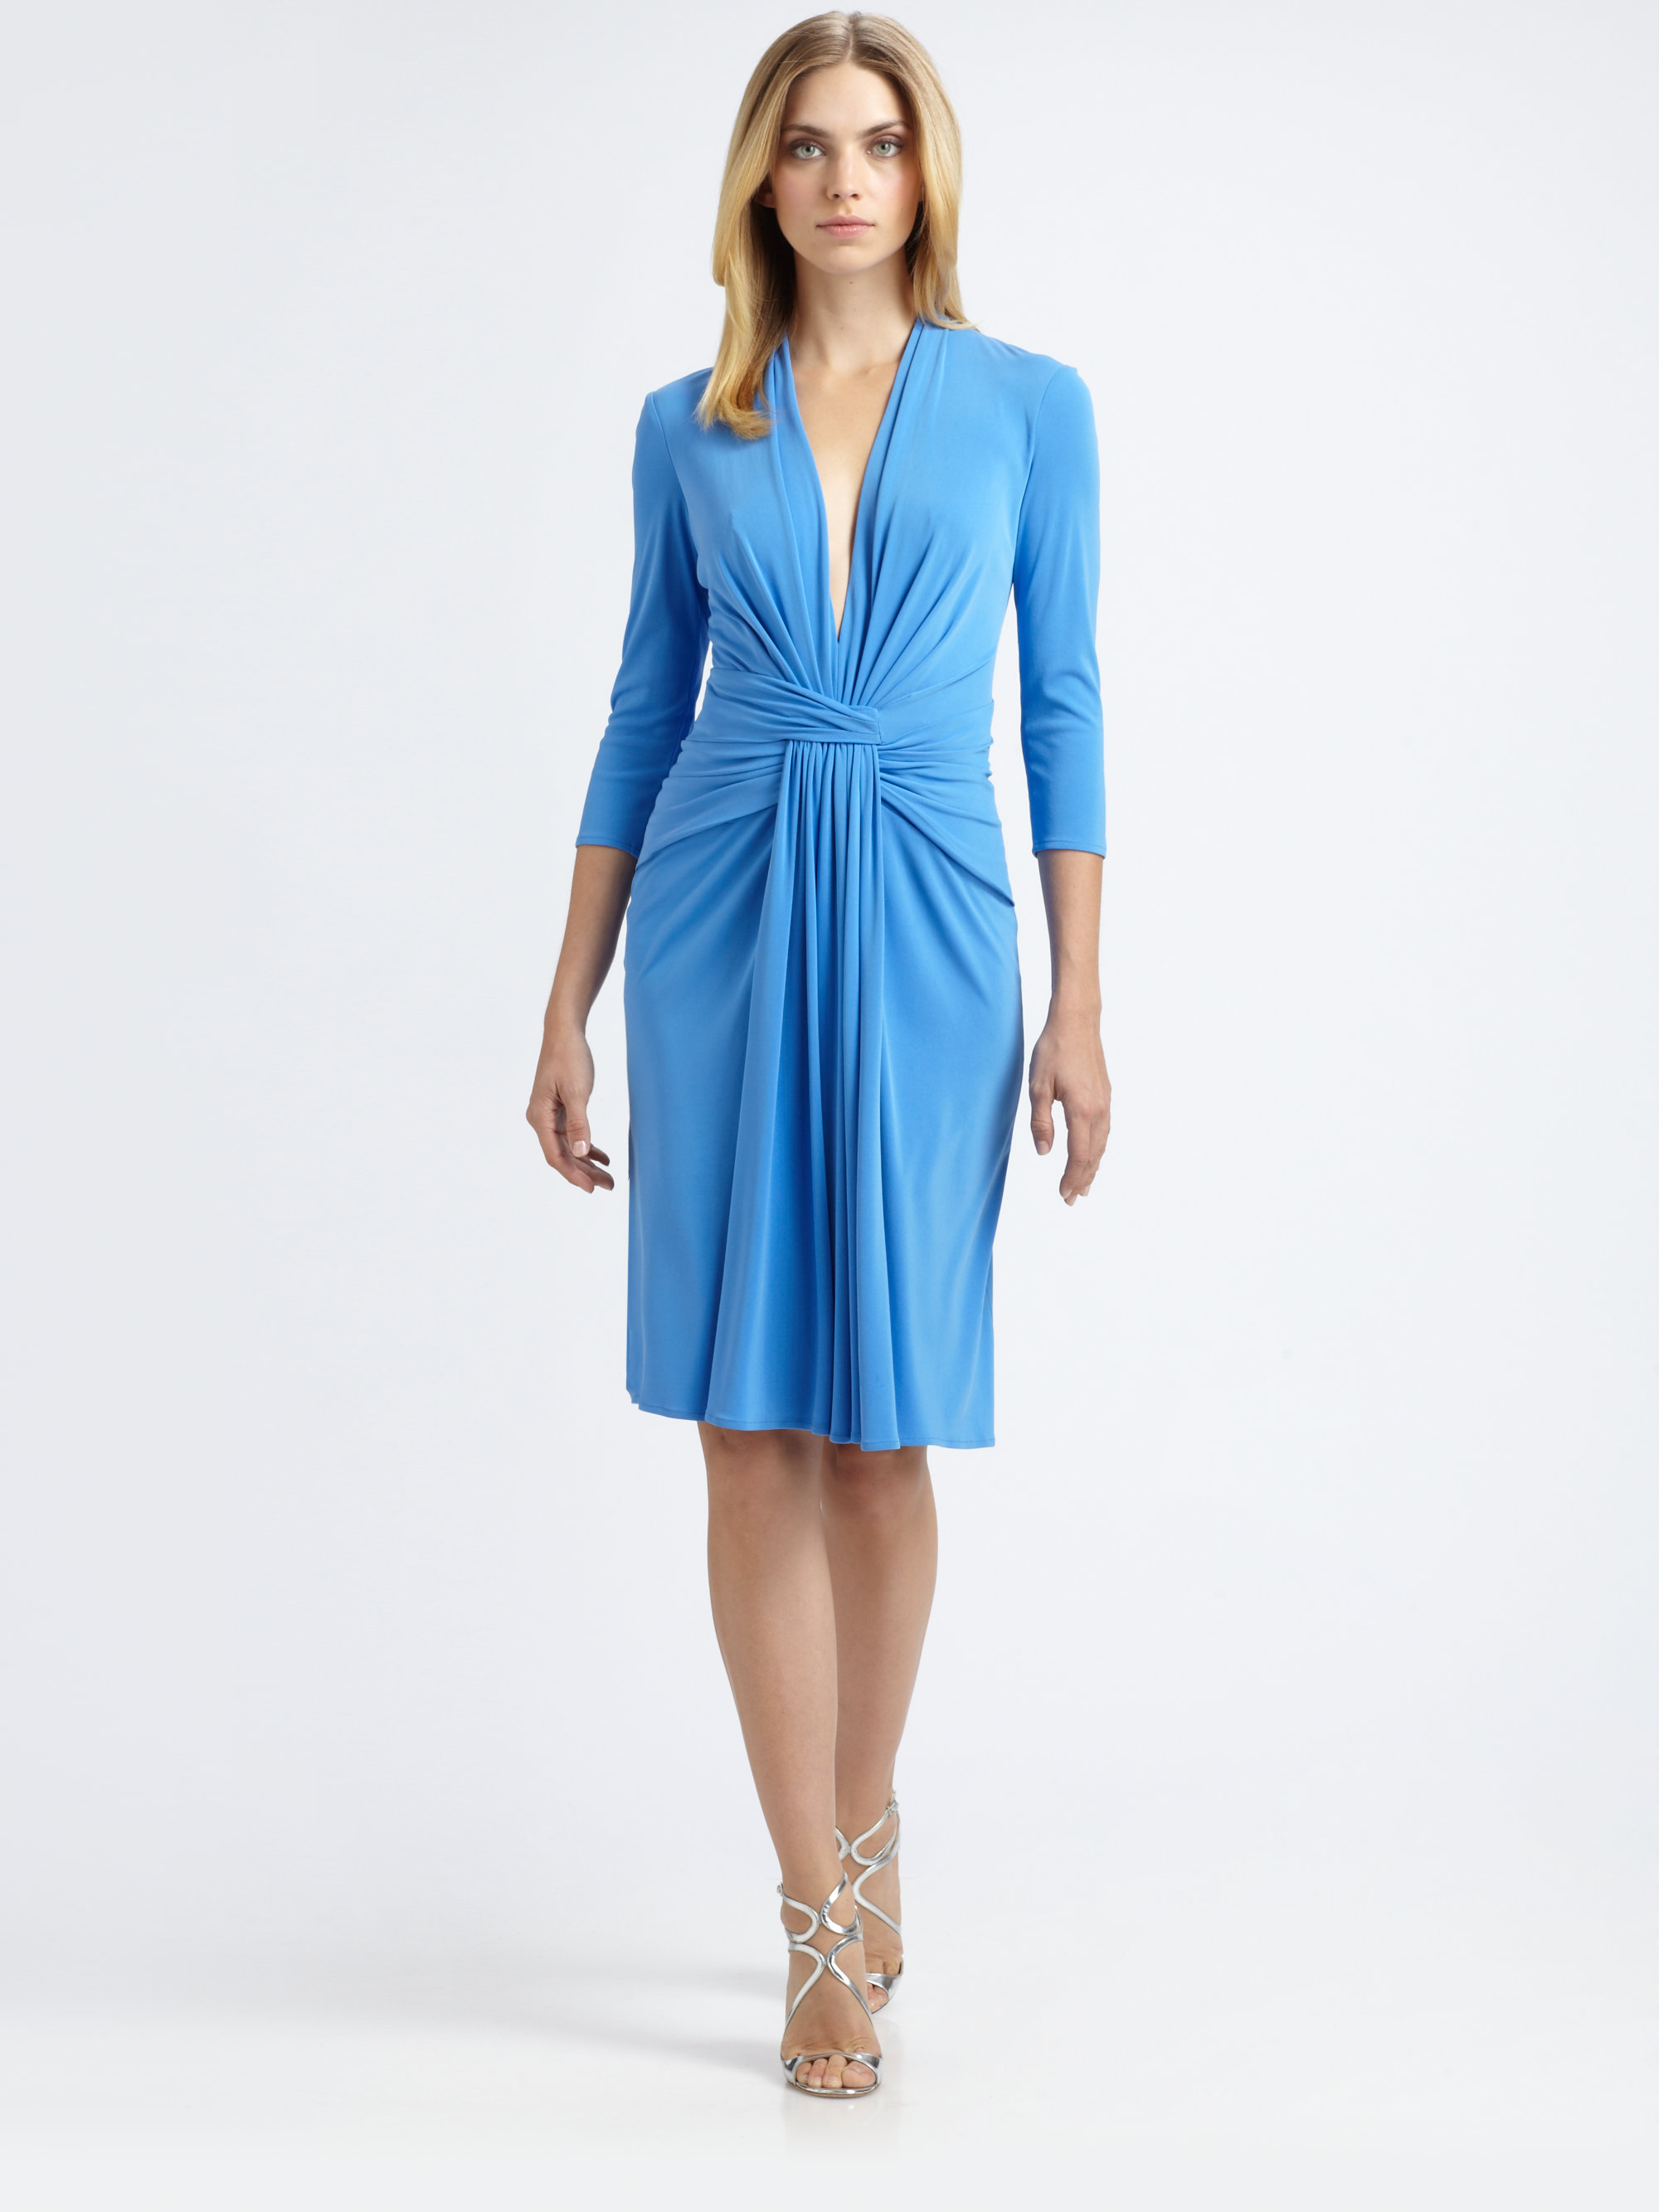 Issa Silk Jersey Dress In Denim Blue Lyst